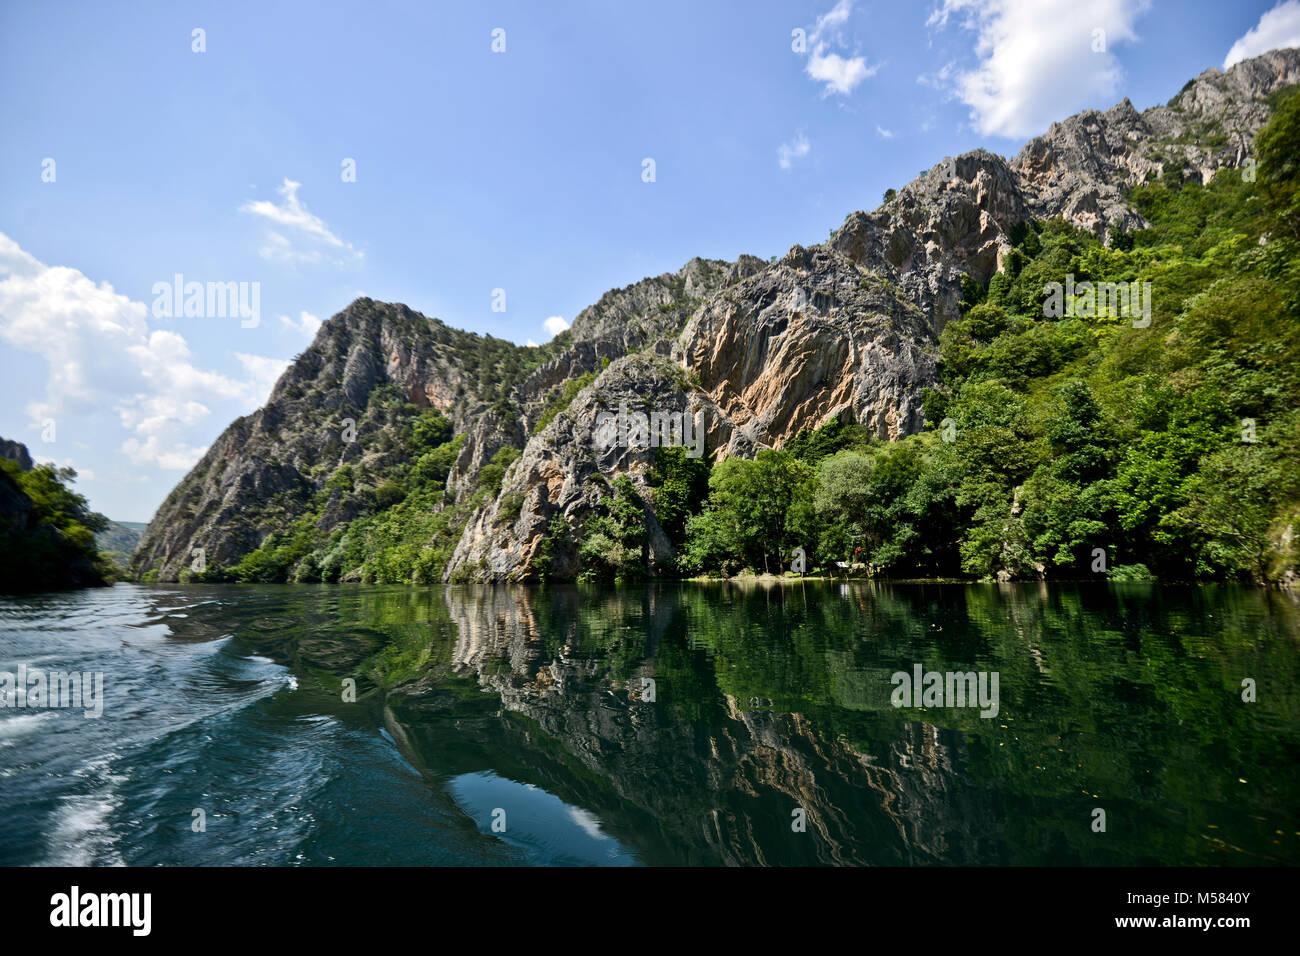 Matka Canyon, Macedonia - Stock Image